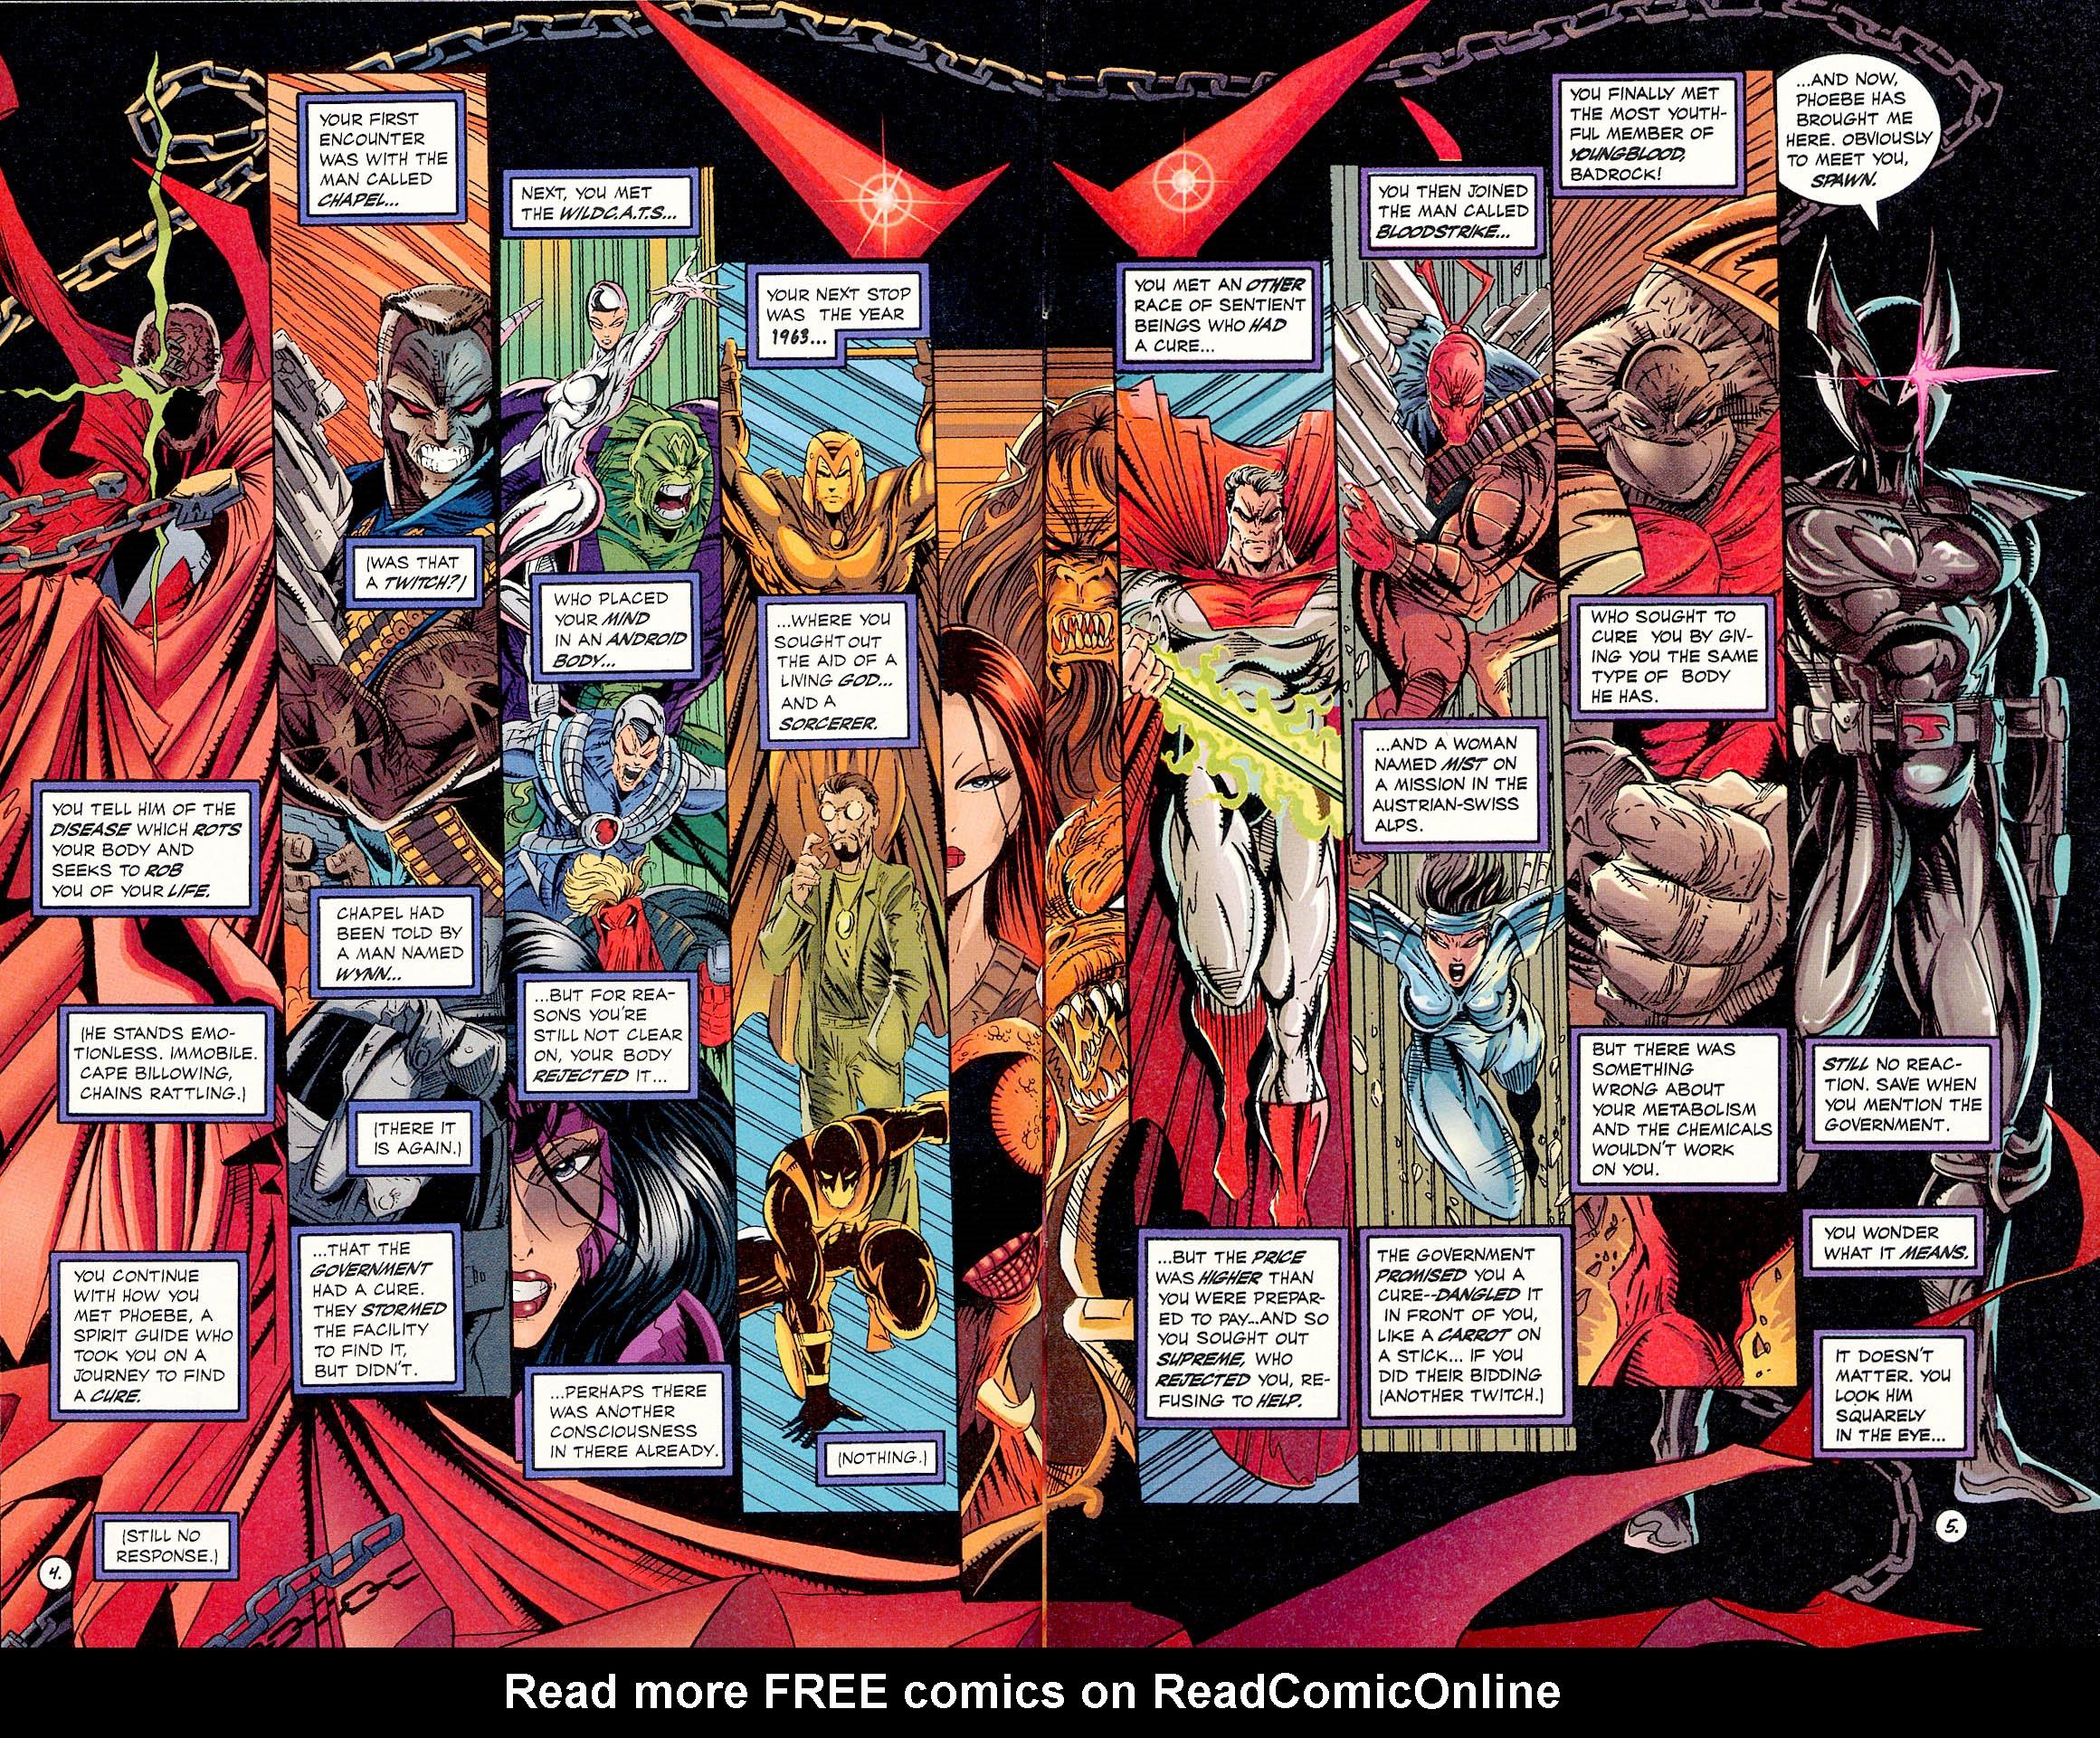 Read online ShadowHawk comic -  Issue #17 - 5